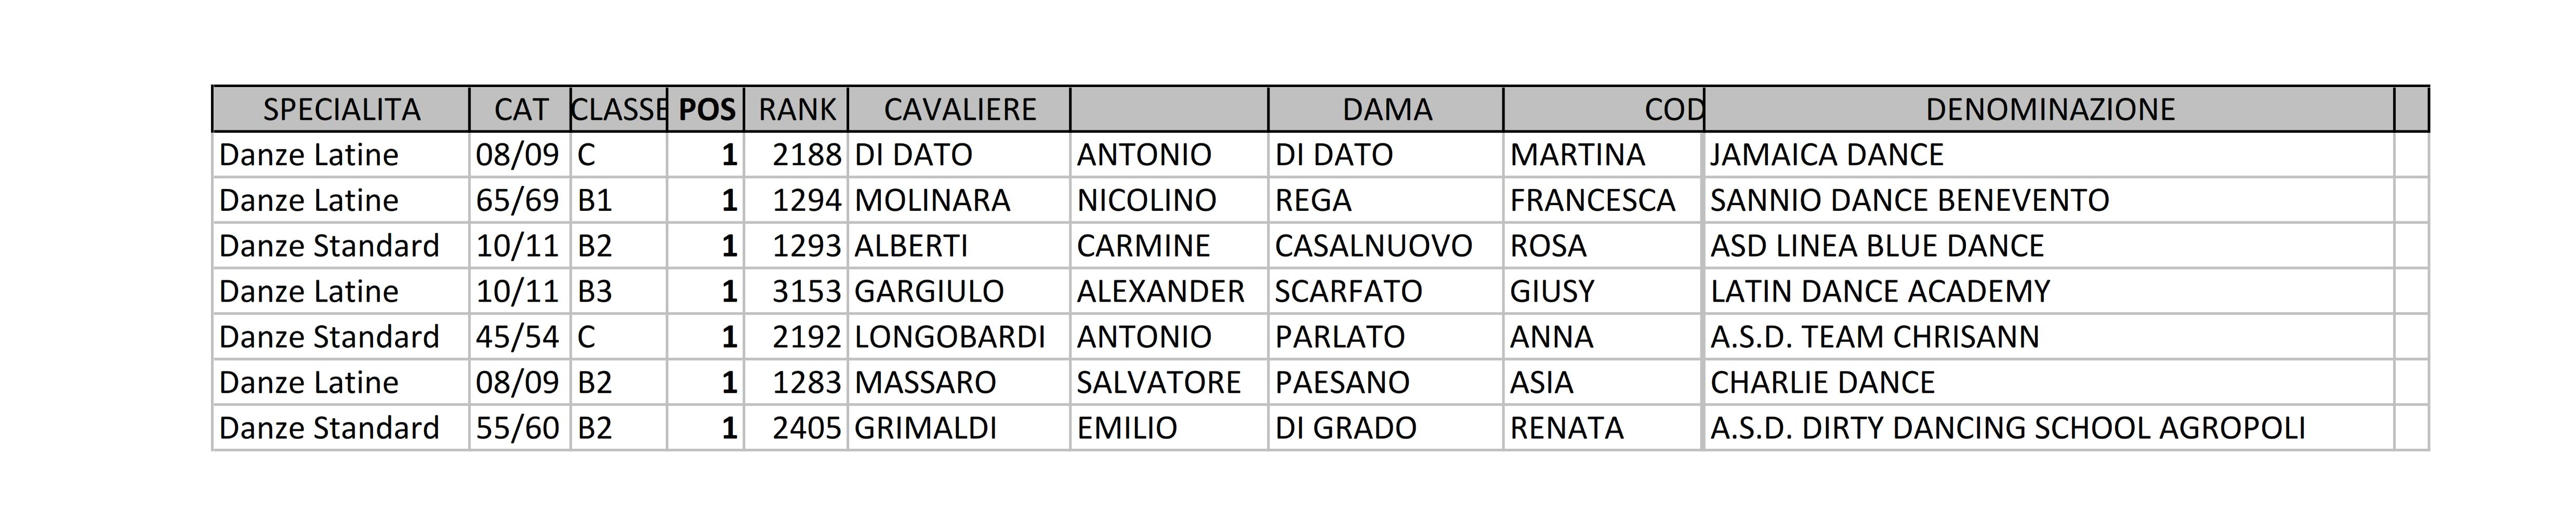 Campania RAKING_001-1  ok_1